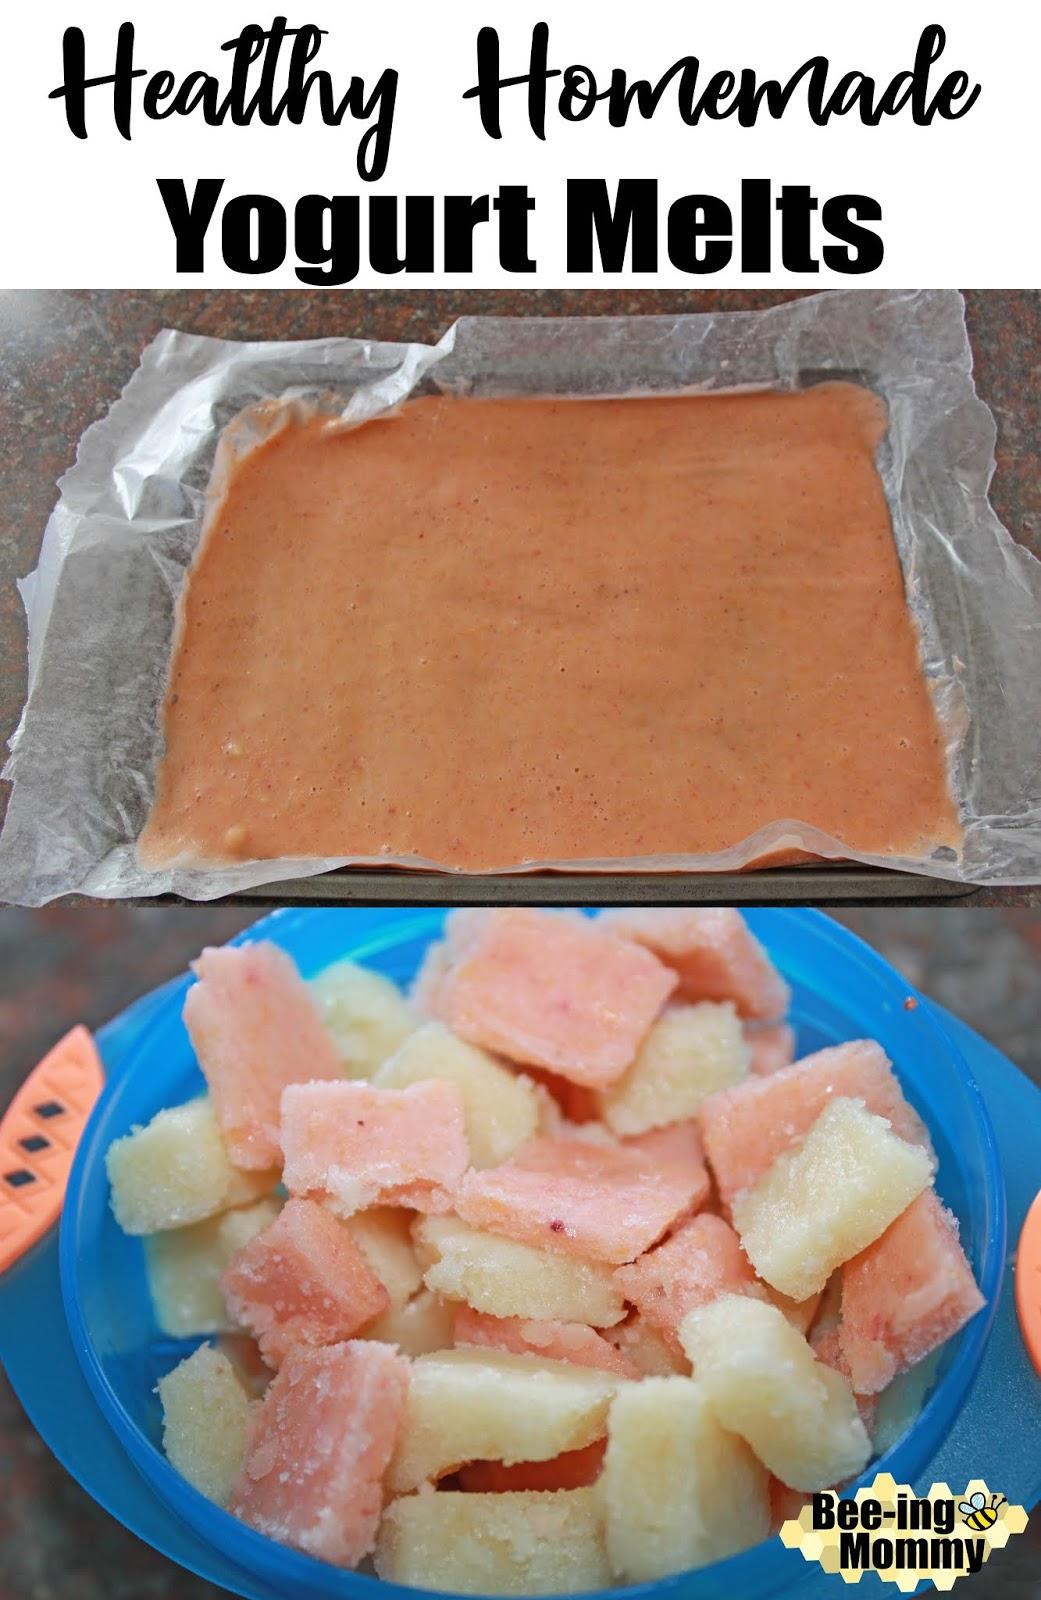 Bee Ing Mommy Blog Healthy Homemade Yogurt Melts Recipe